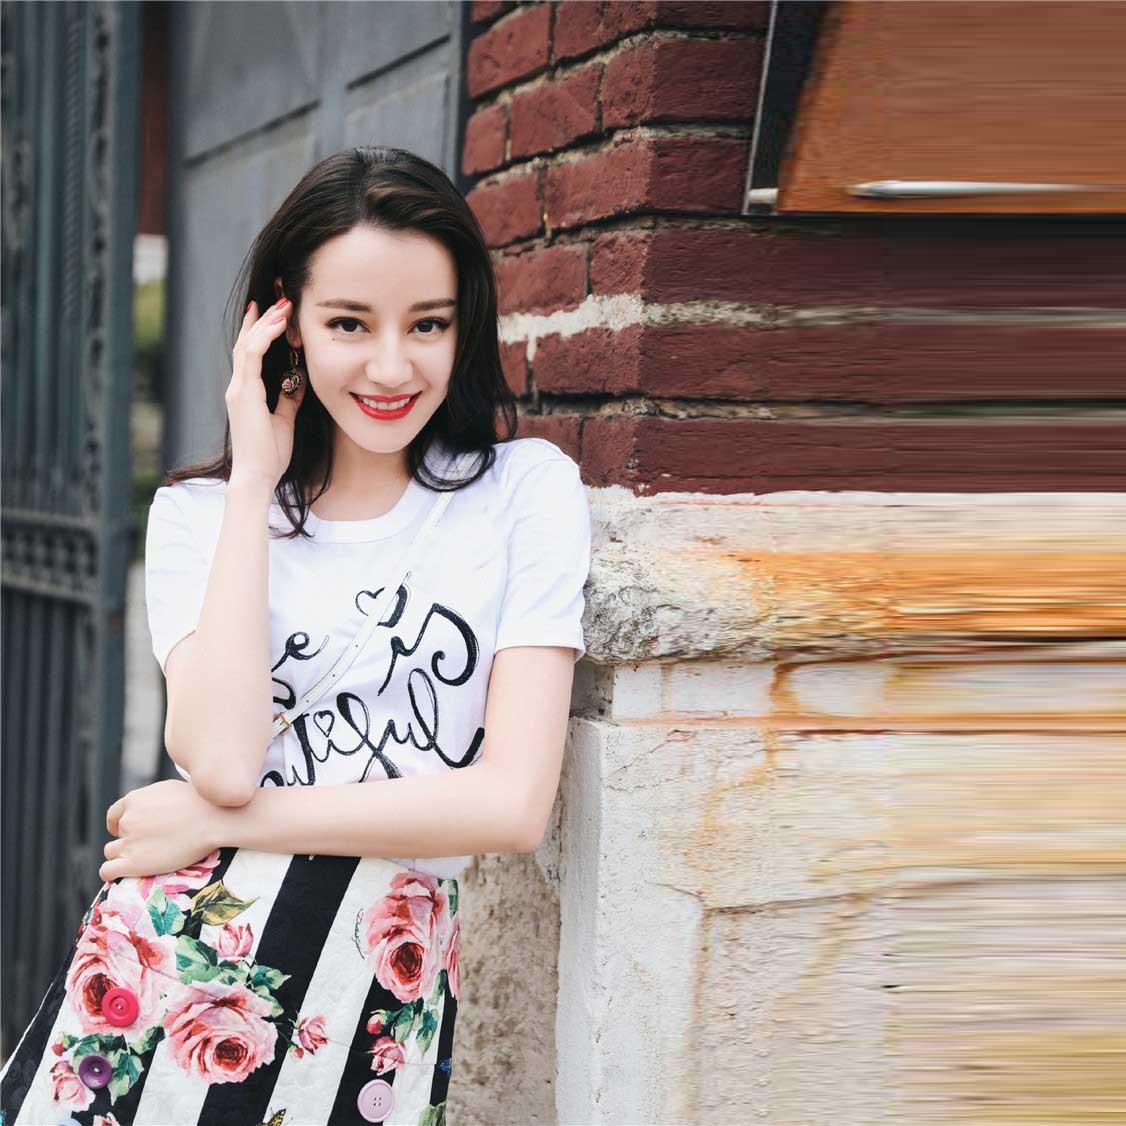 Dilireba та же Роза полосатая пуговица украшенная A half юбка 2019 Line Цветочная 1236.jpg